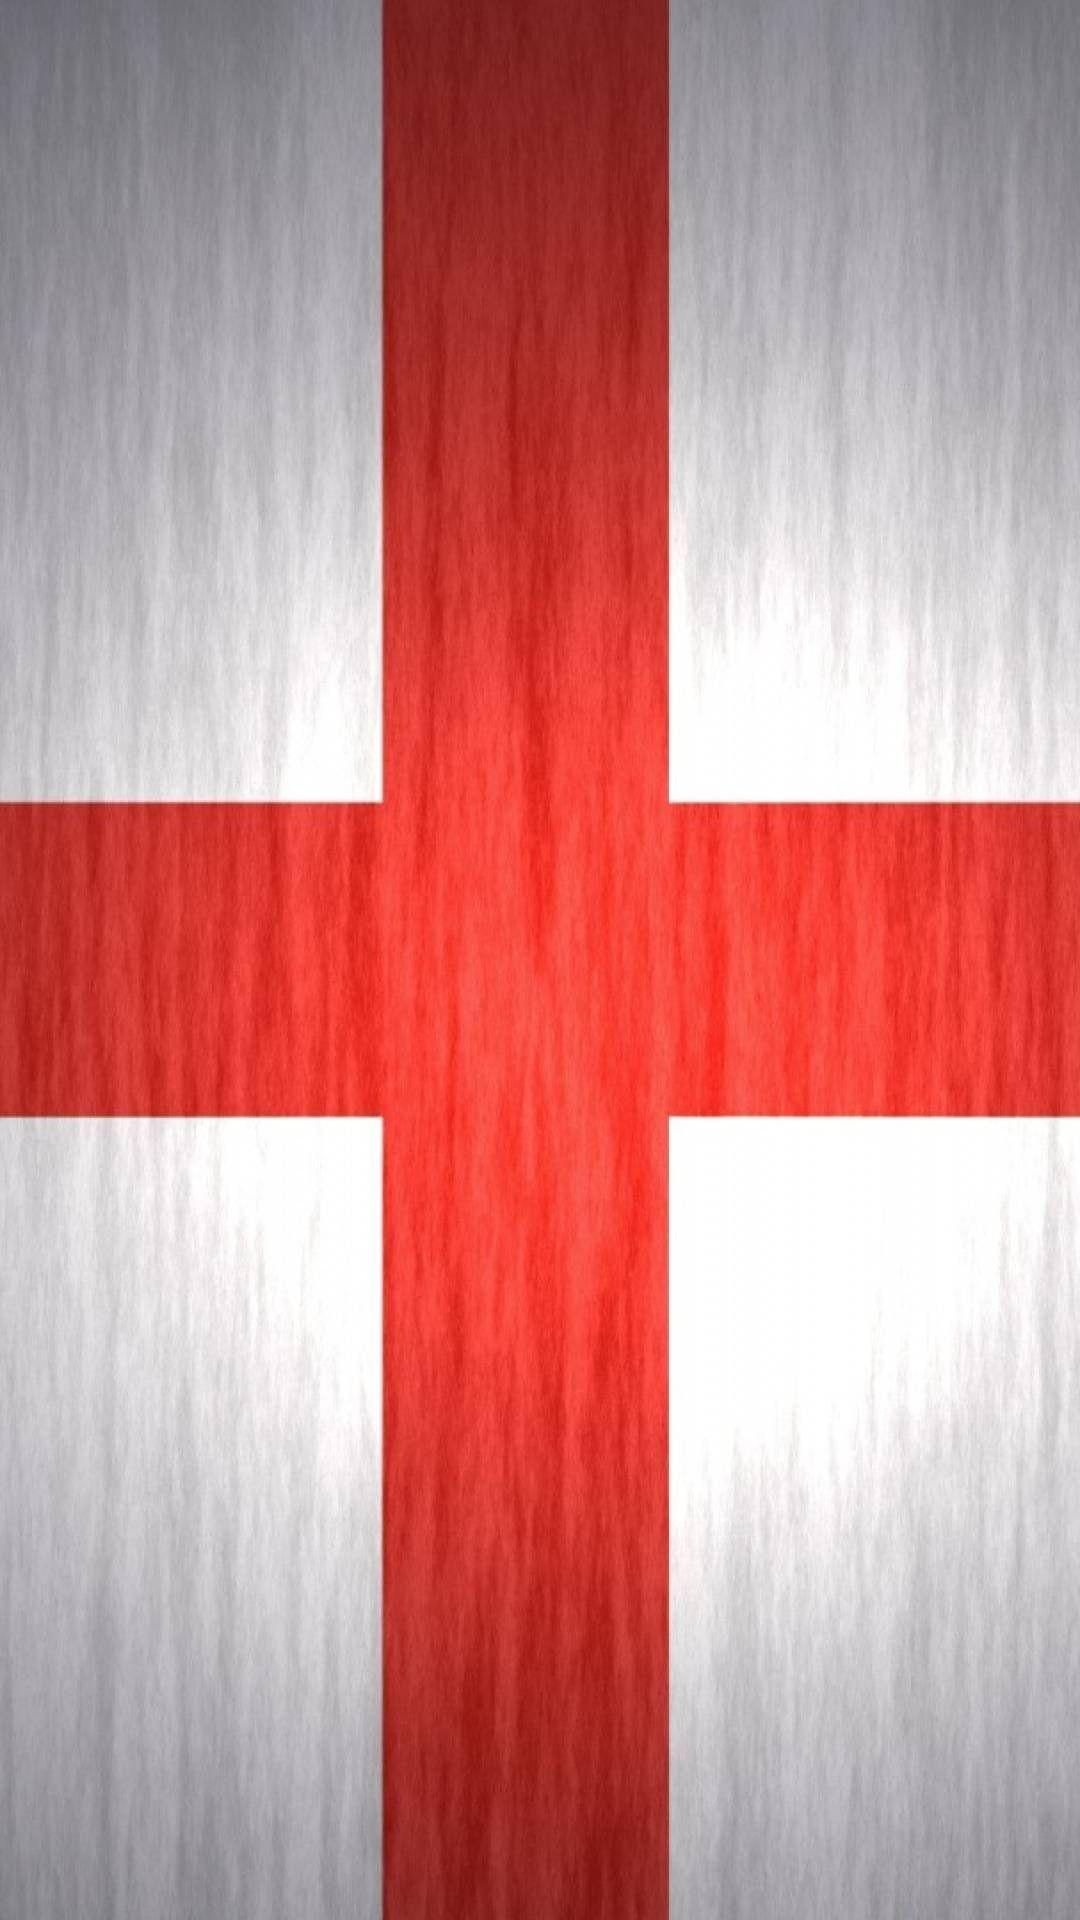 England St George Flag Wallpaper England Flag Wallpaper England Flag Phone Wallpaper For Men